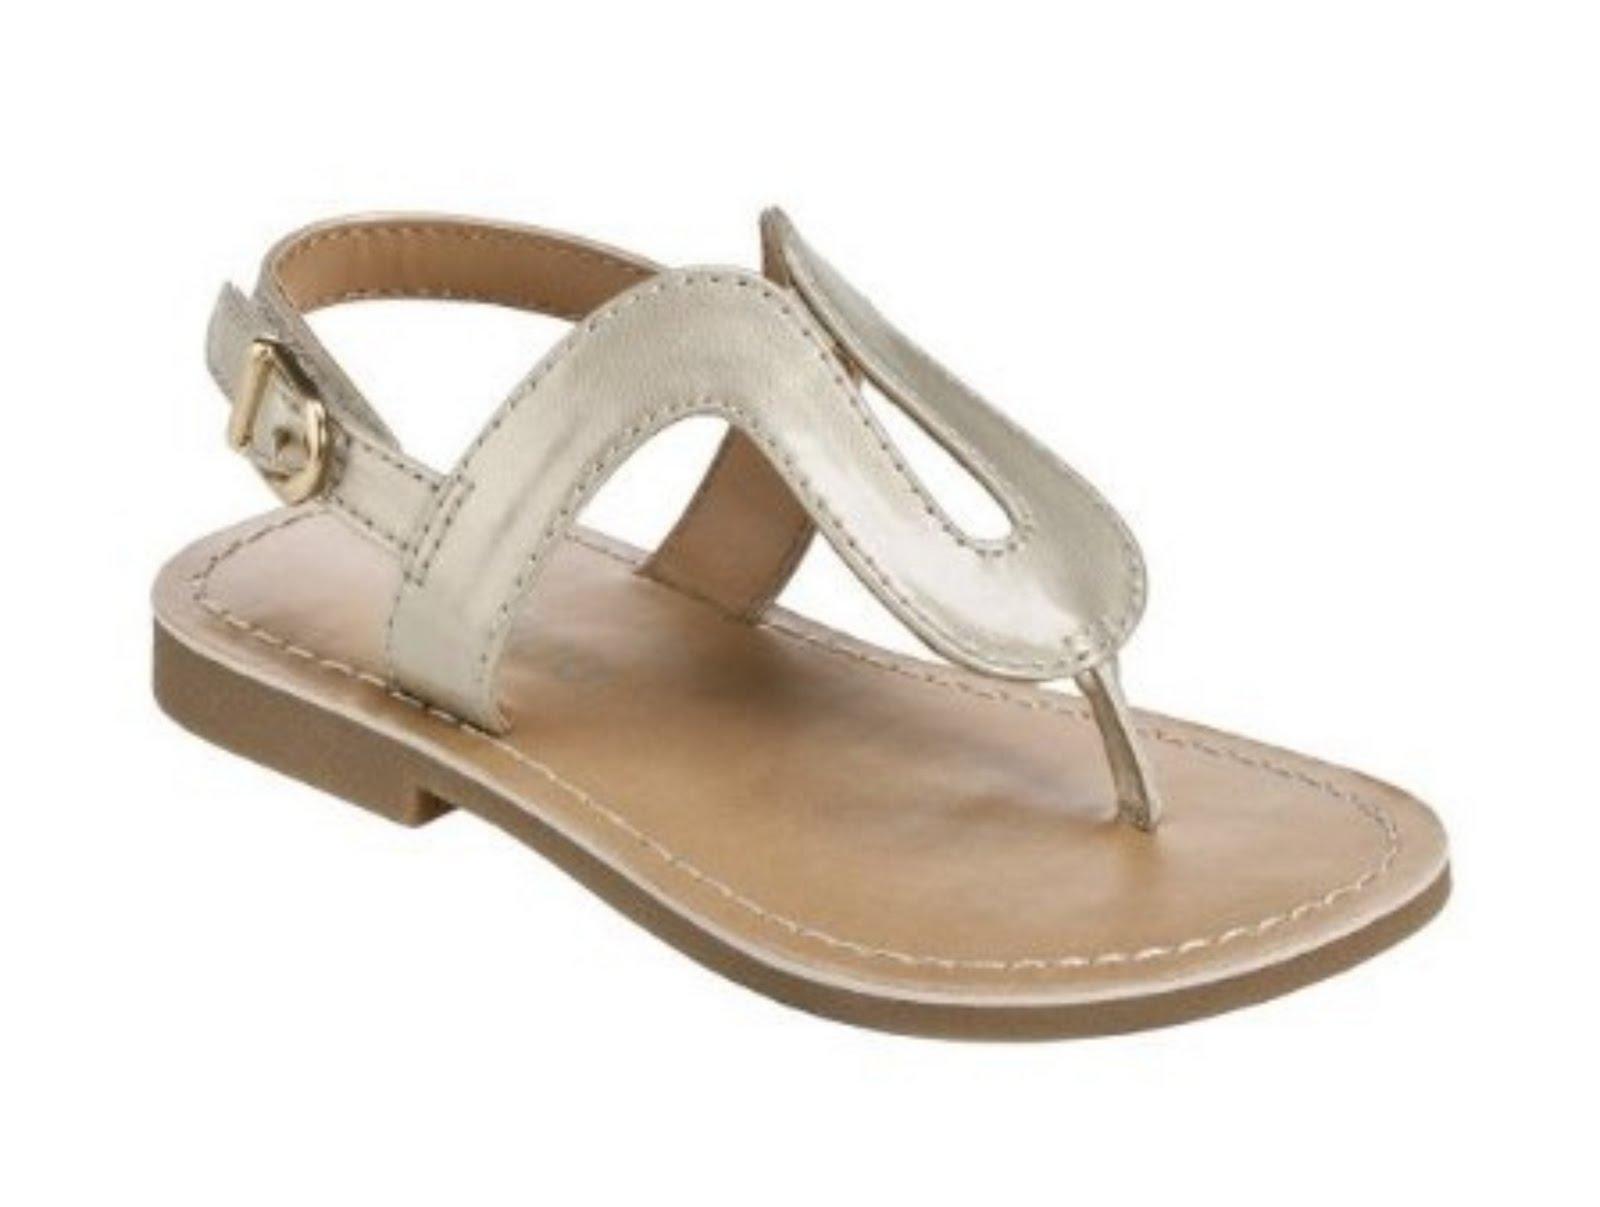 Zara Girl Shoes Uk